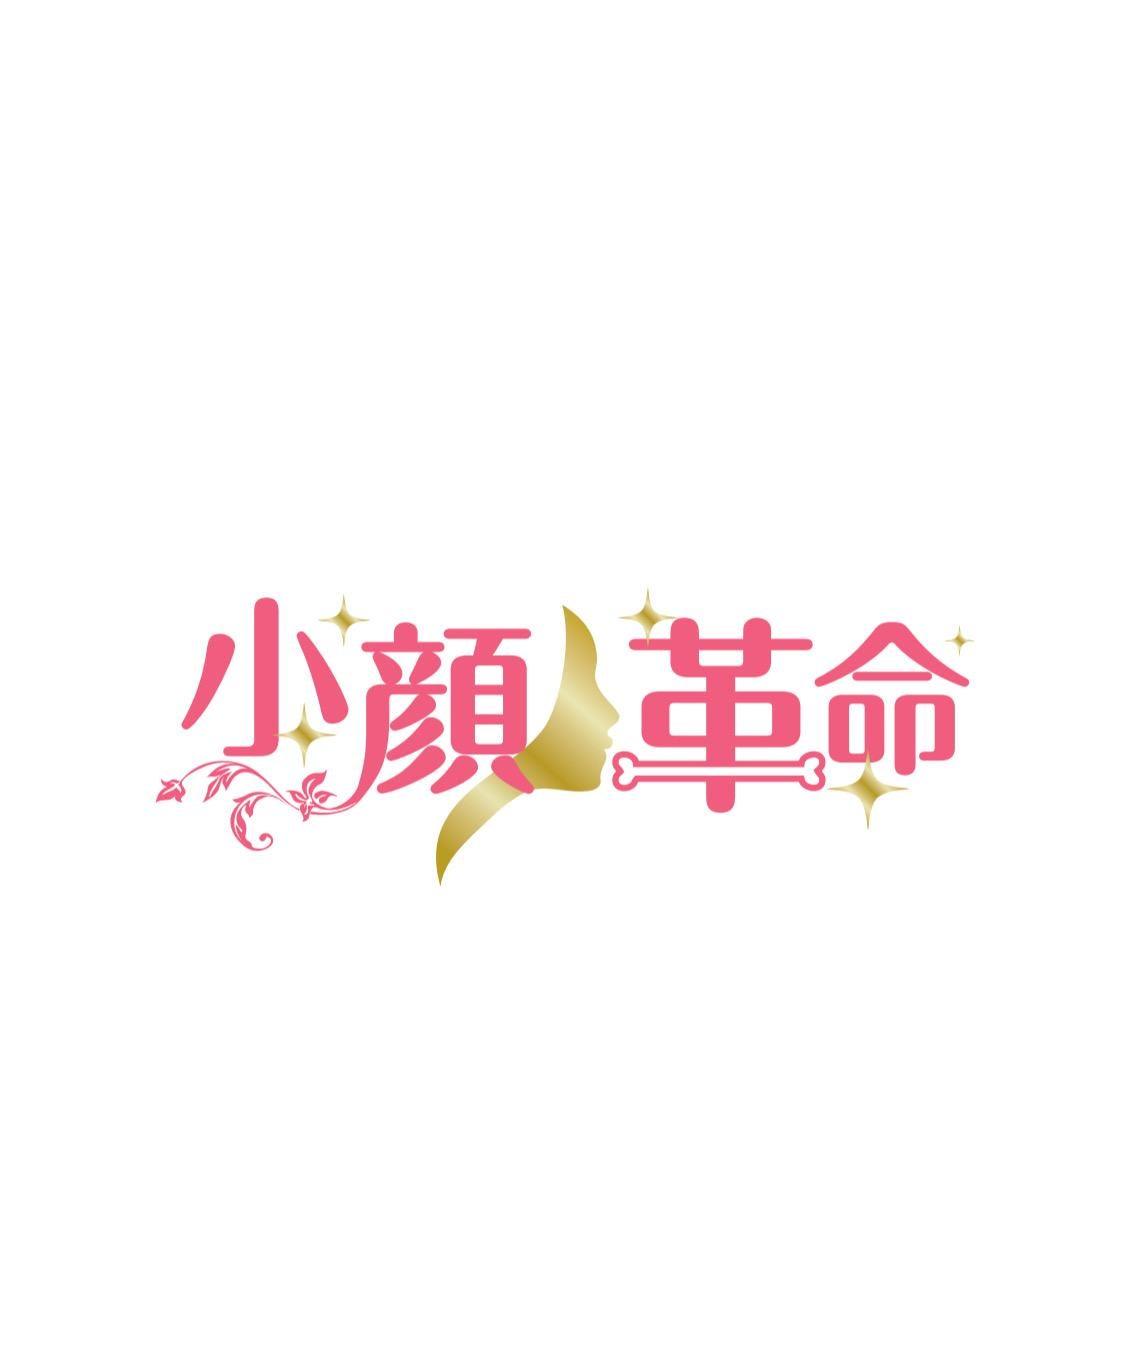 kogaokakumei